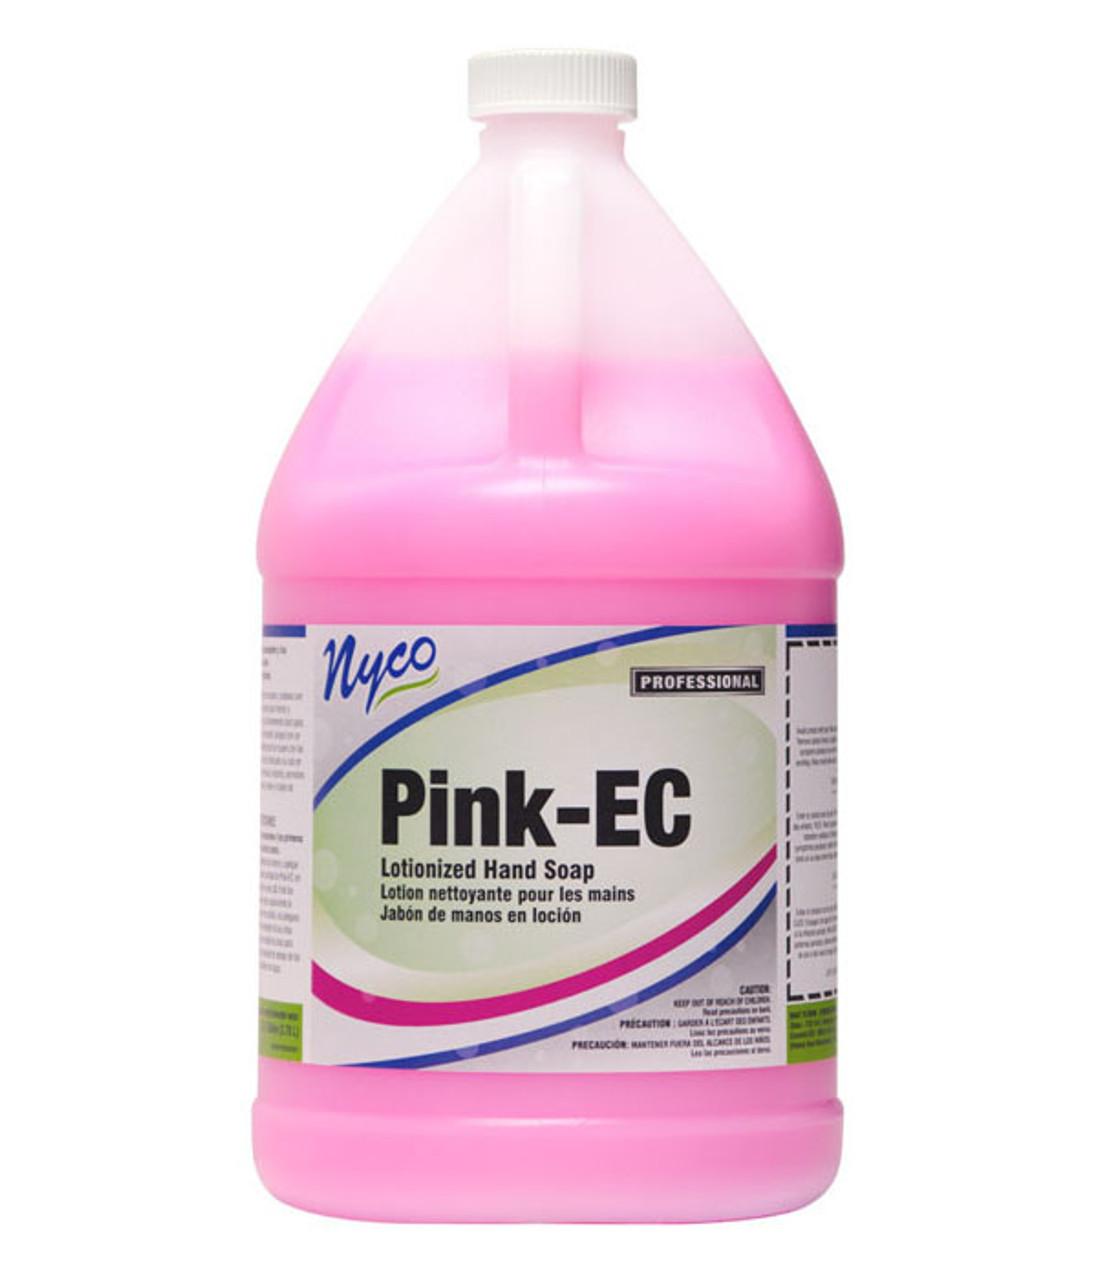 Pink-EC Lotionized Hand Soap